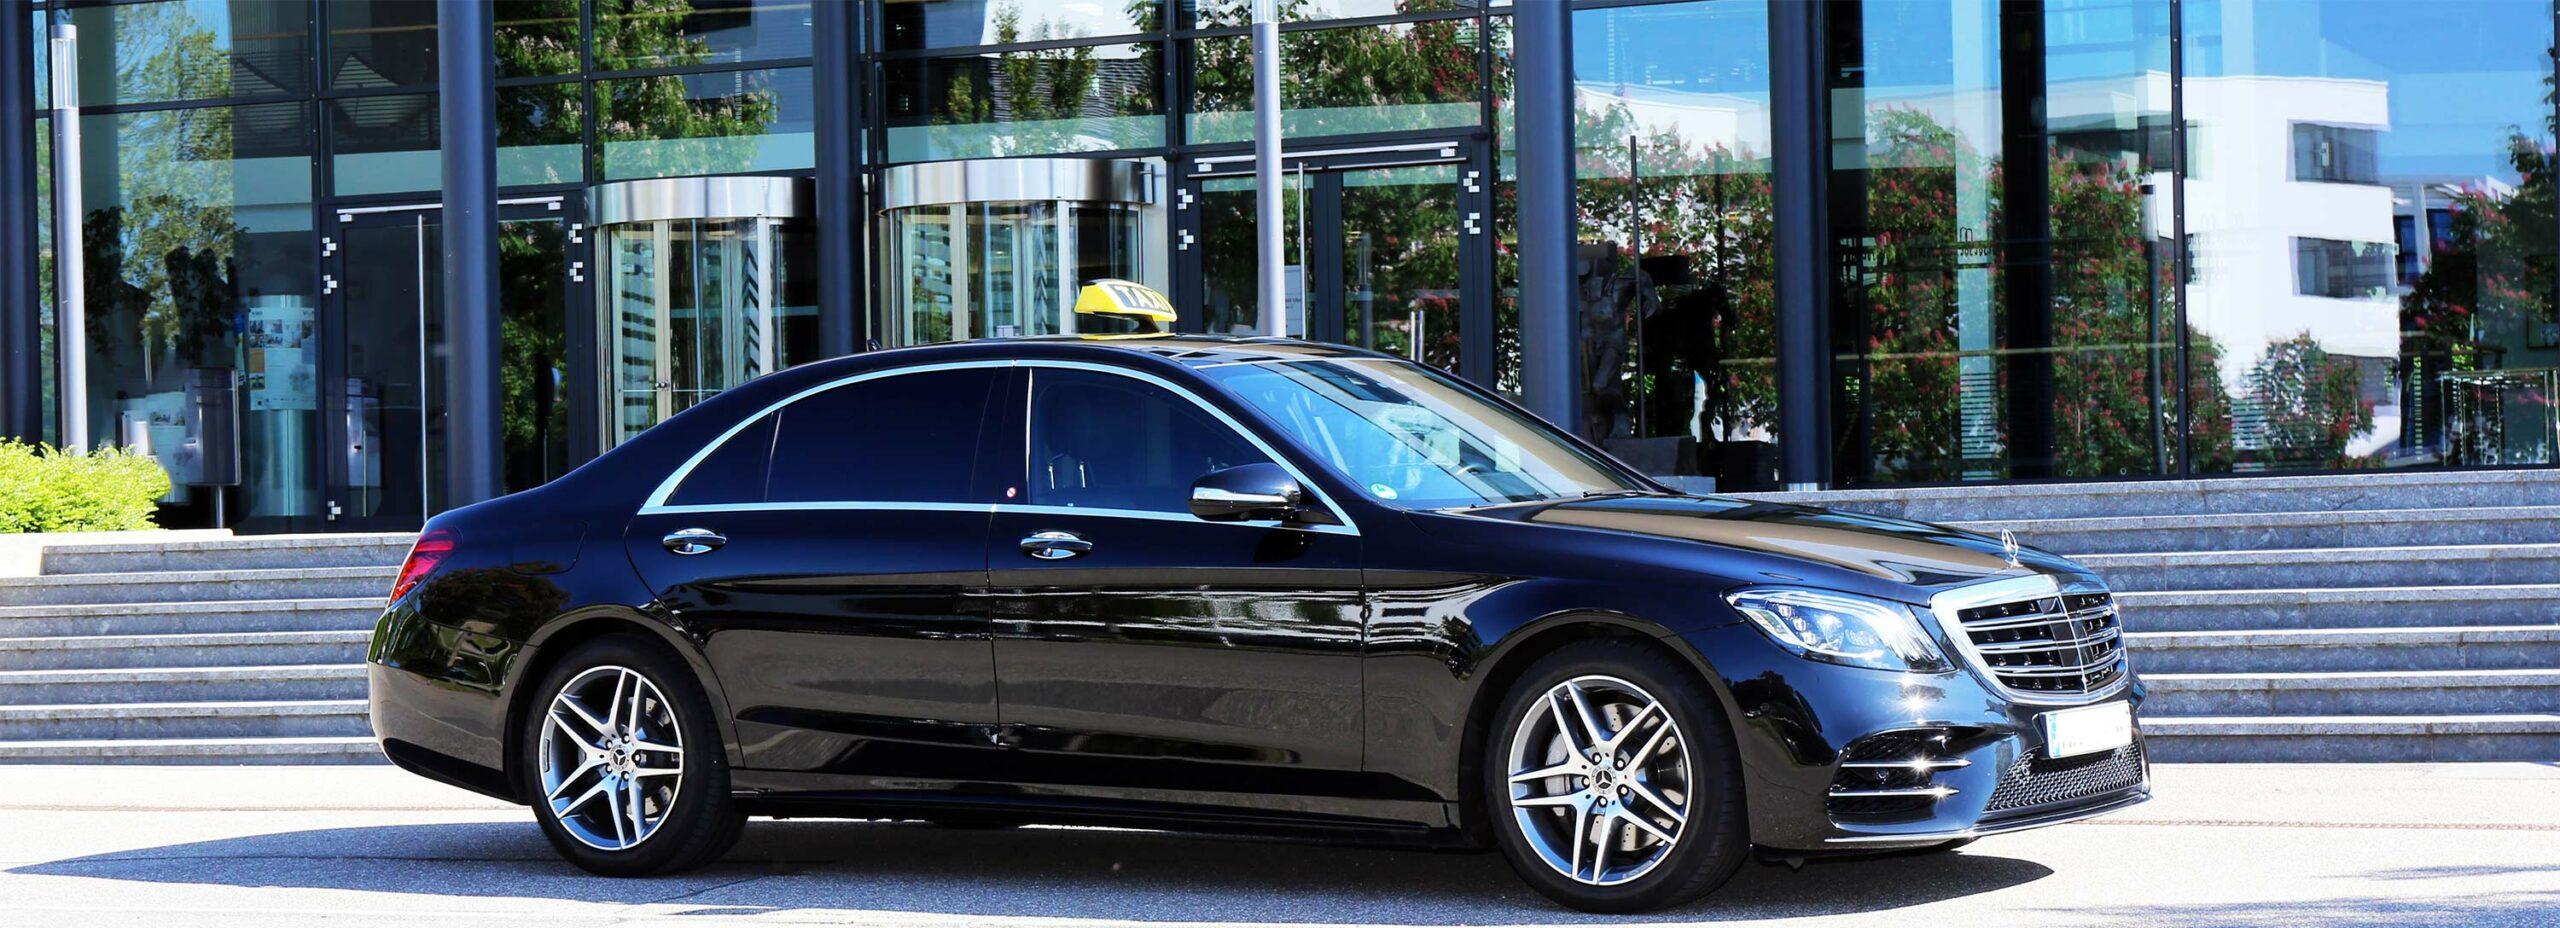 Taxiservice Heilbronn Luxus